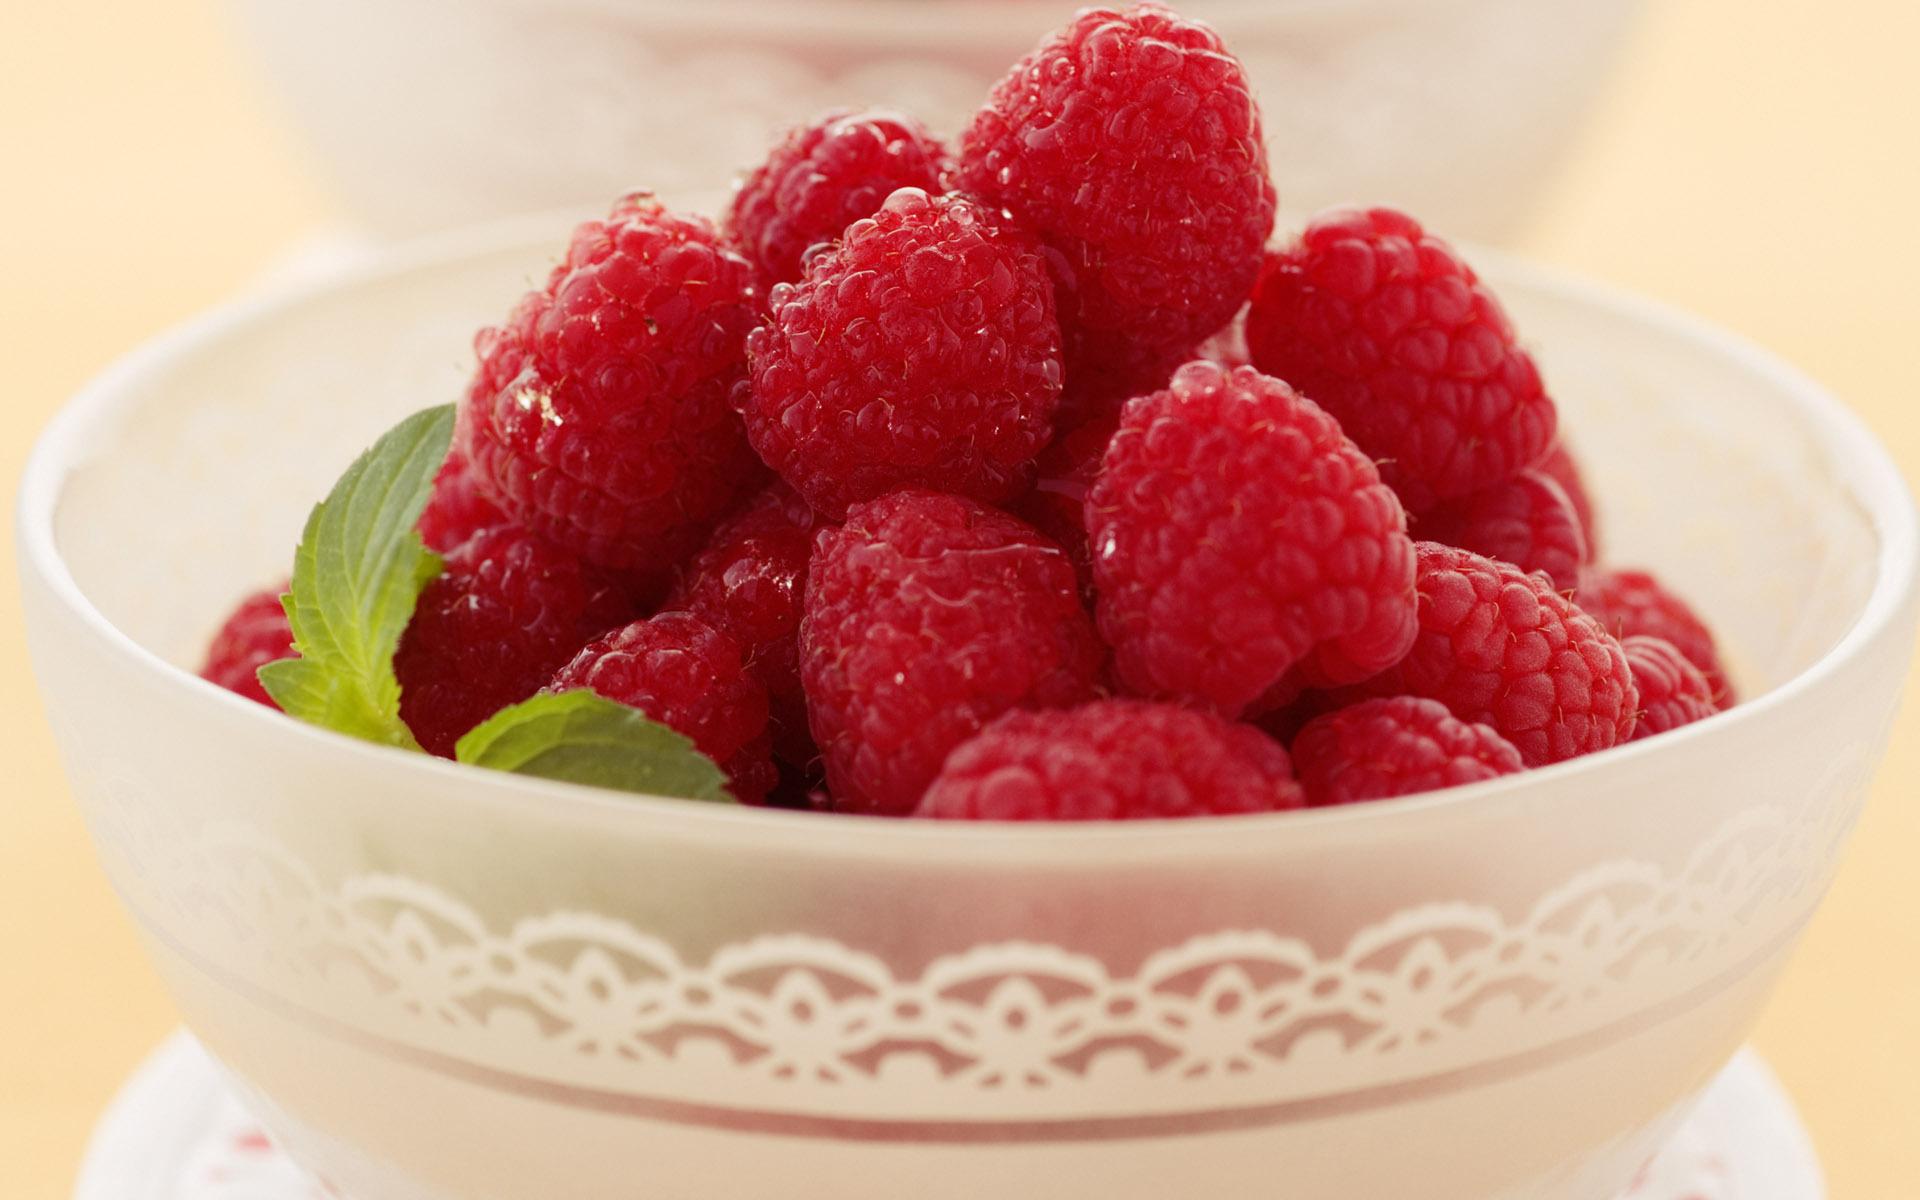 еда малина ягоды  № 2884520 бесплатно